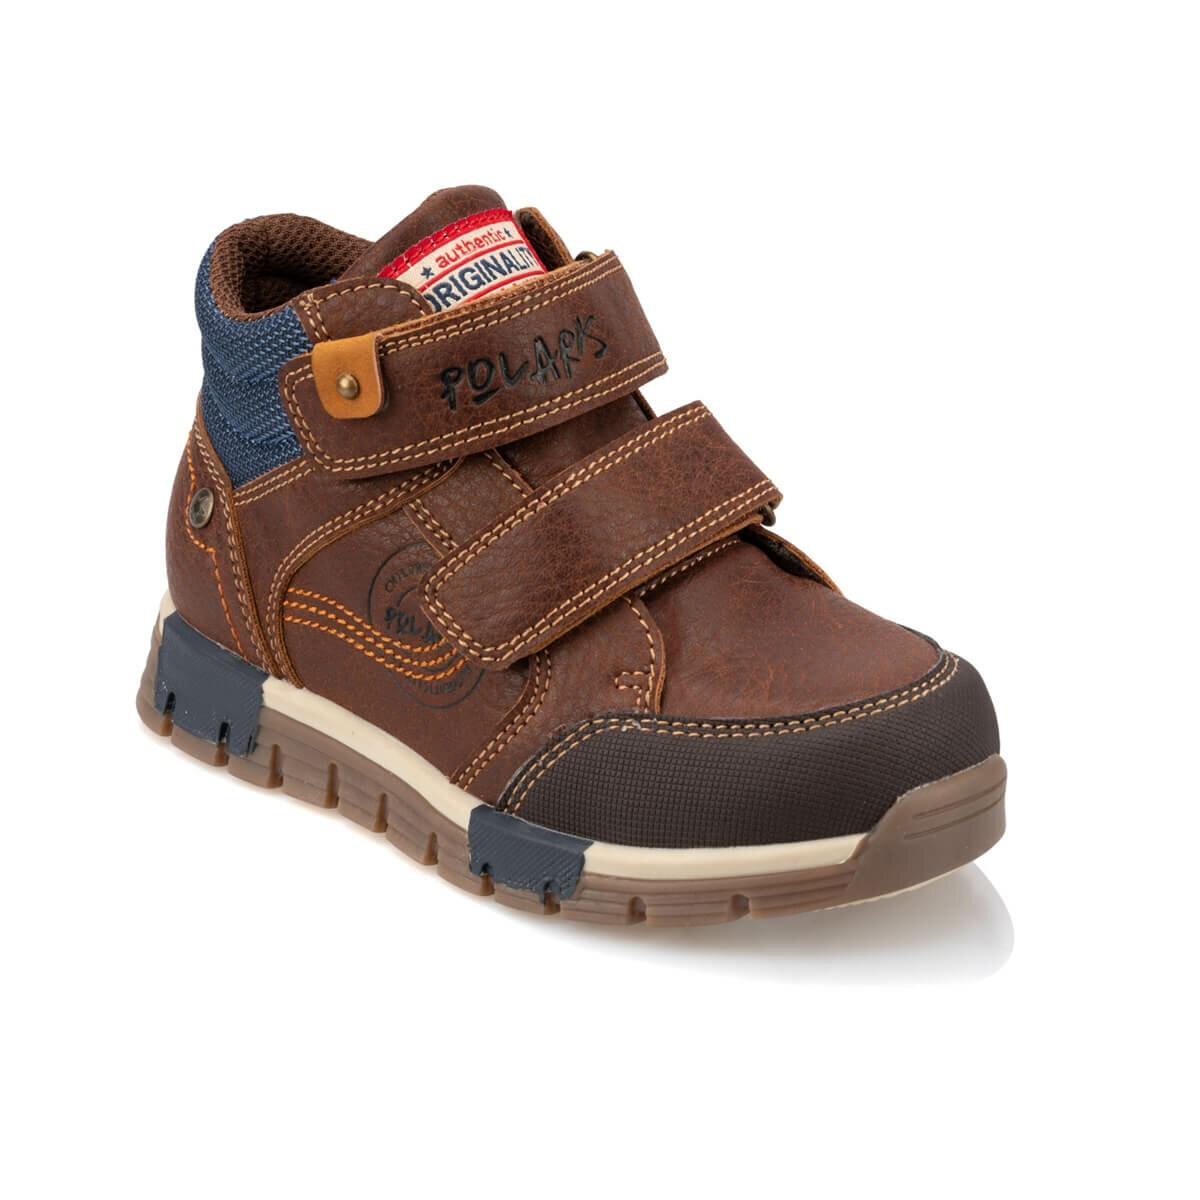 FLO 92.511976.P Brown Male Child Sports Shoes Polaris